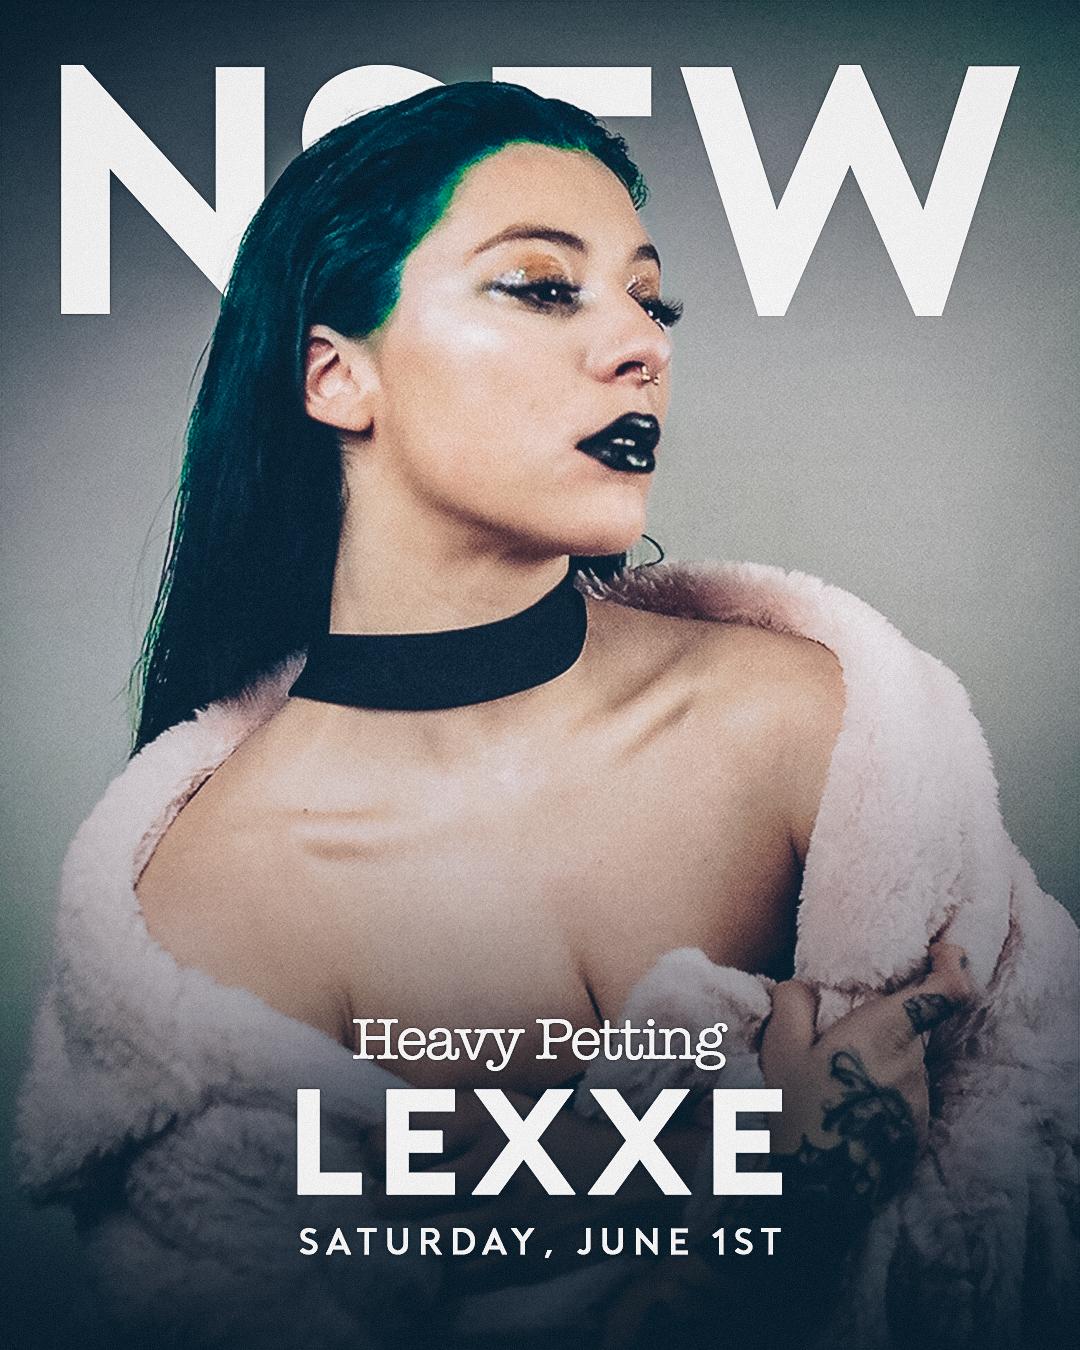 HEAVYPETTING_LEXXE-EDITED.jpg